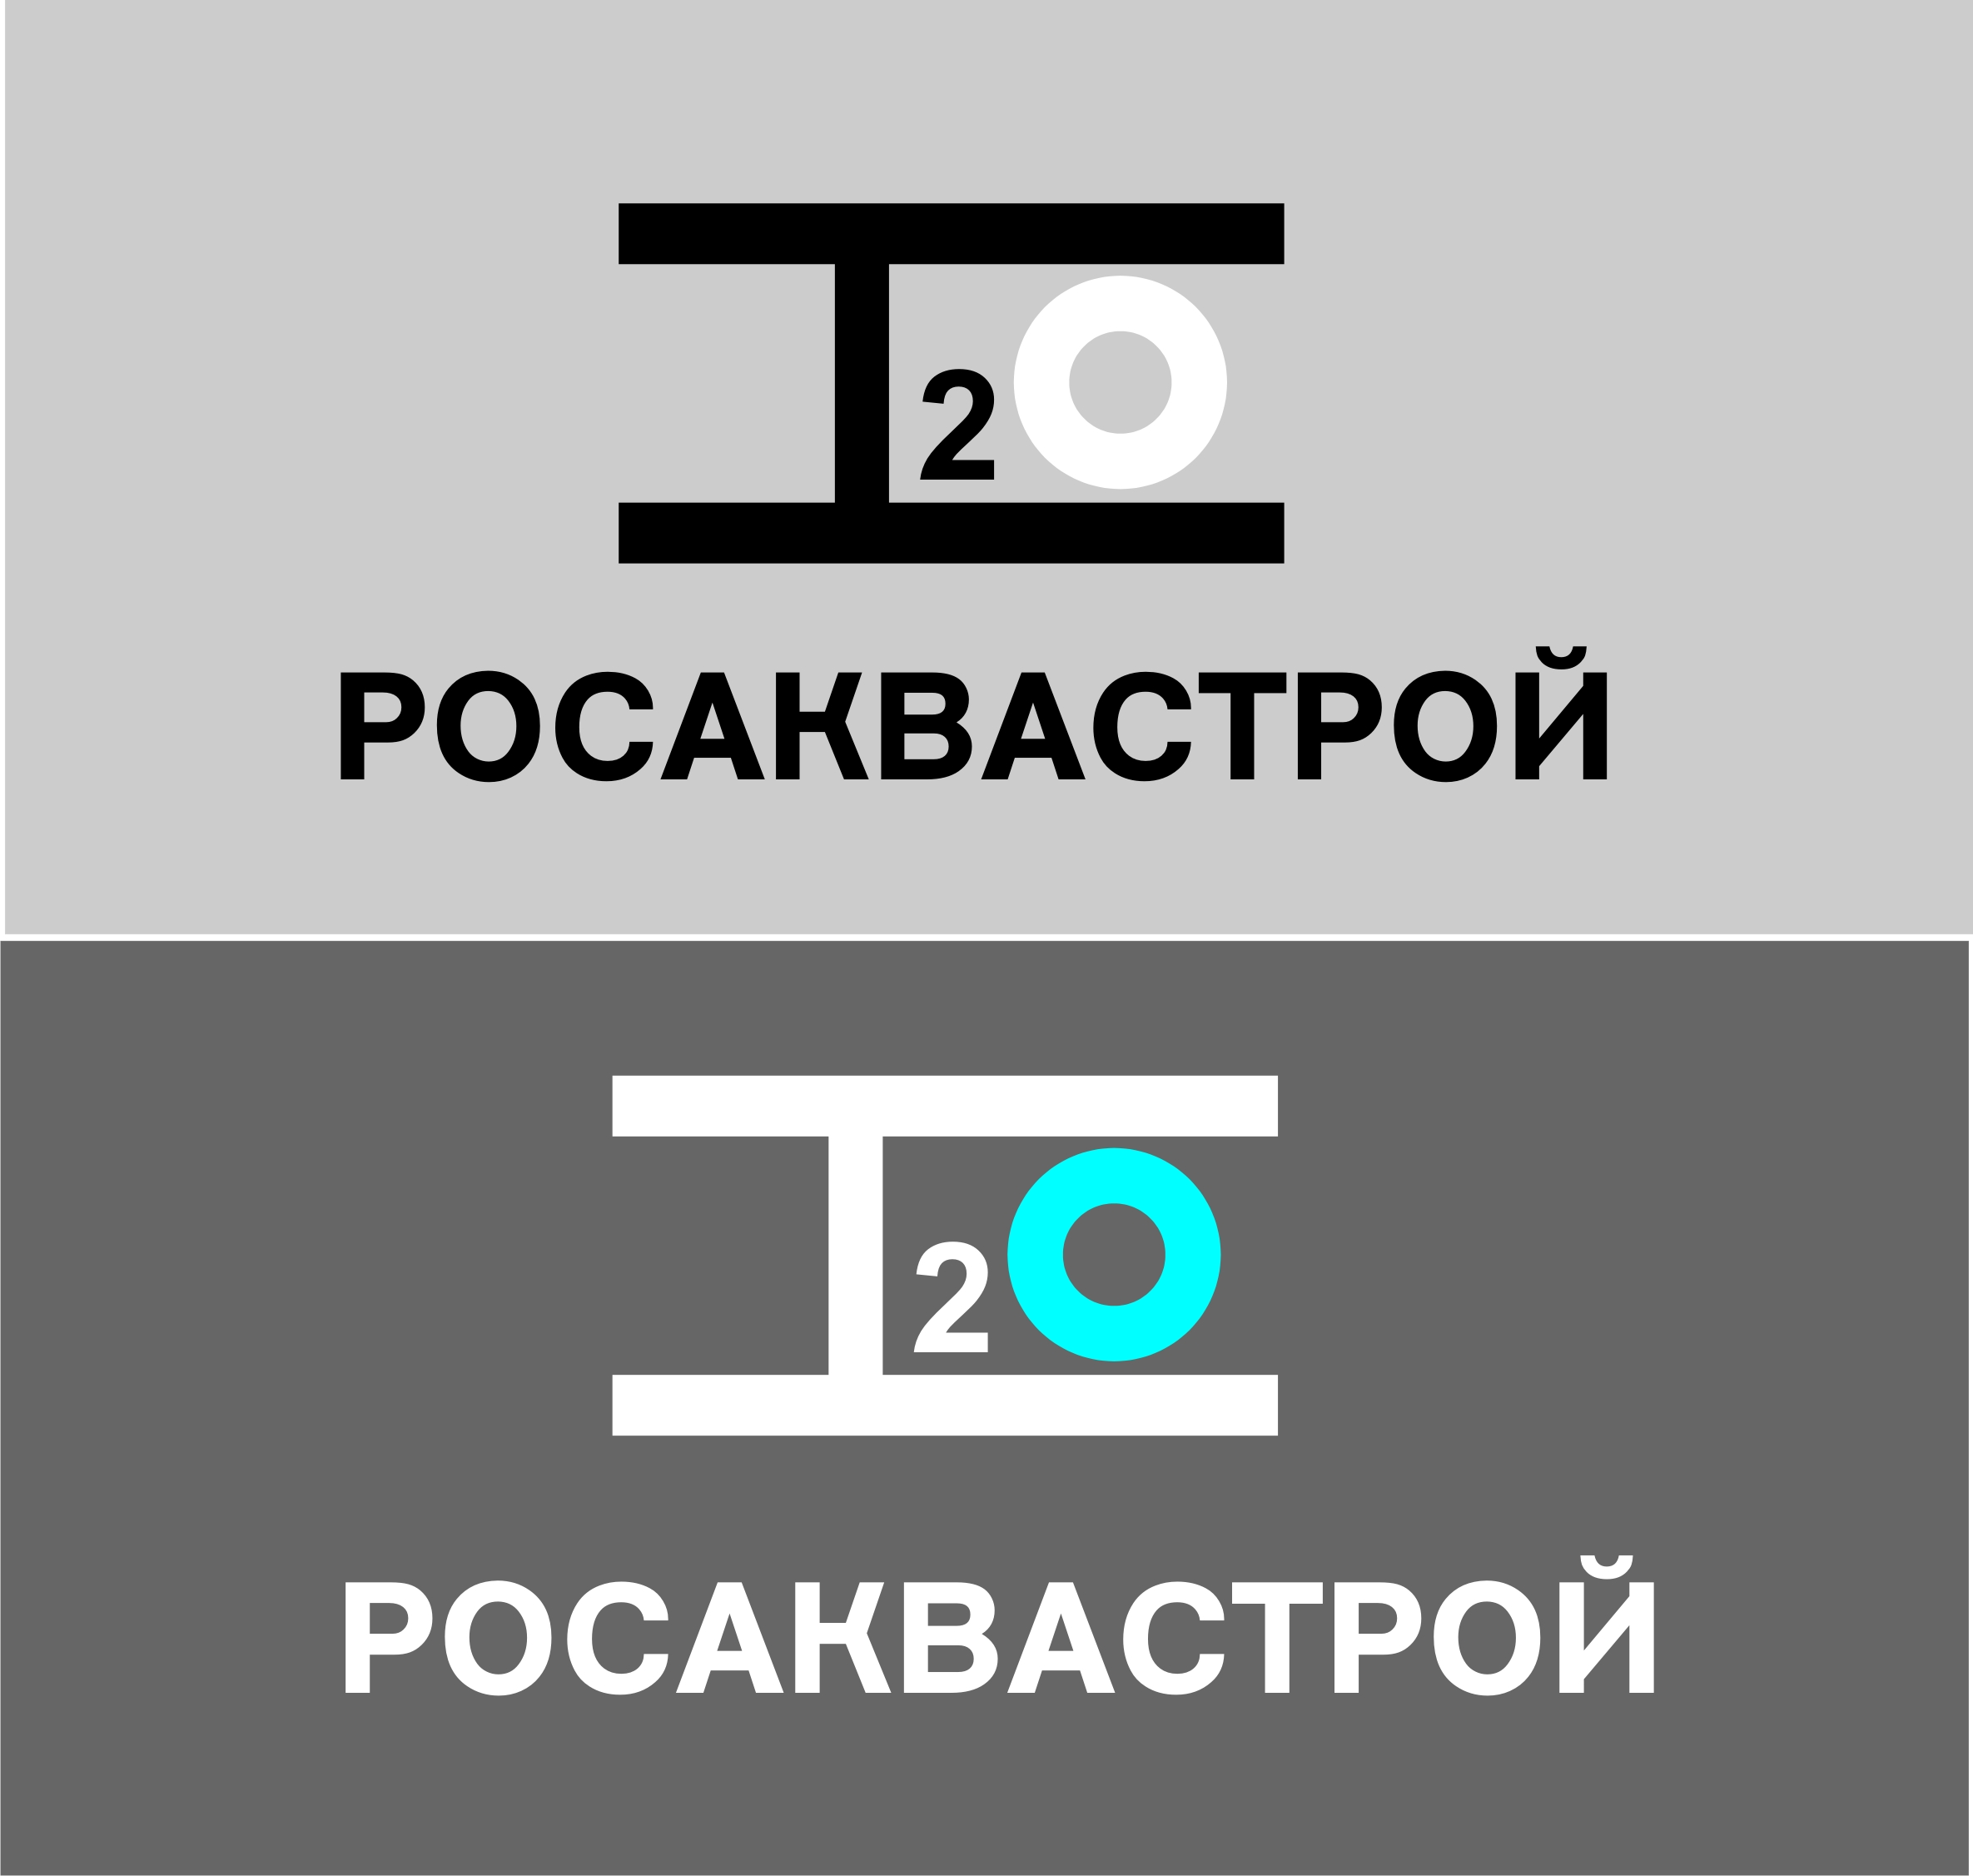 Создание логотипа фото f_4ebbf6dd7ea5f.jpg